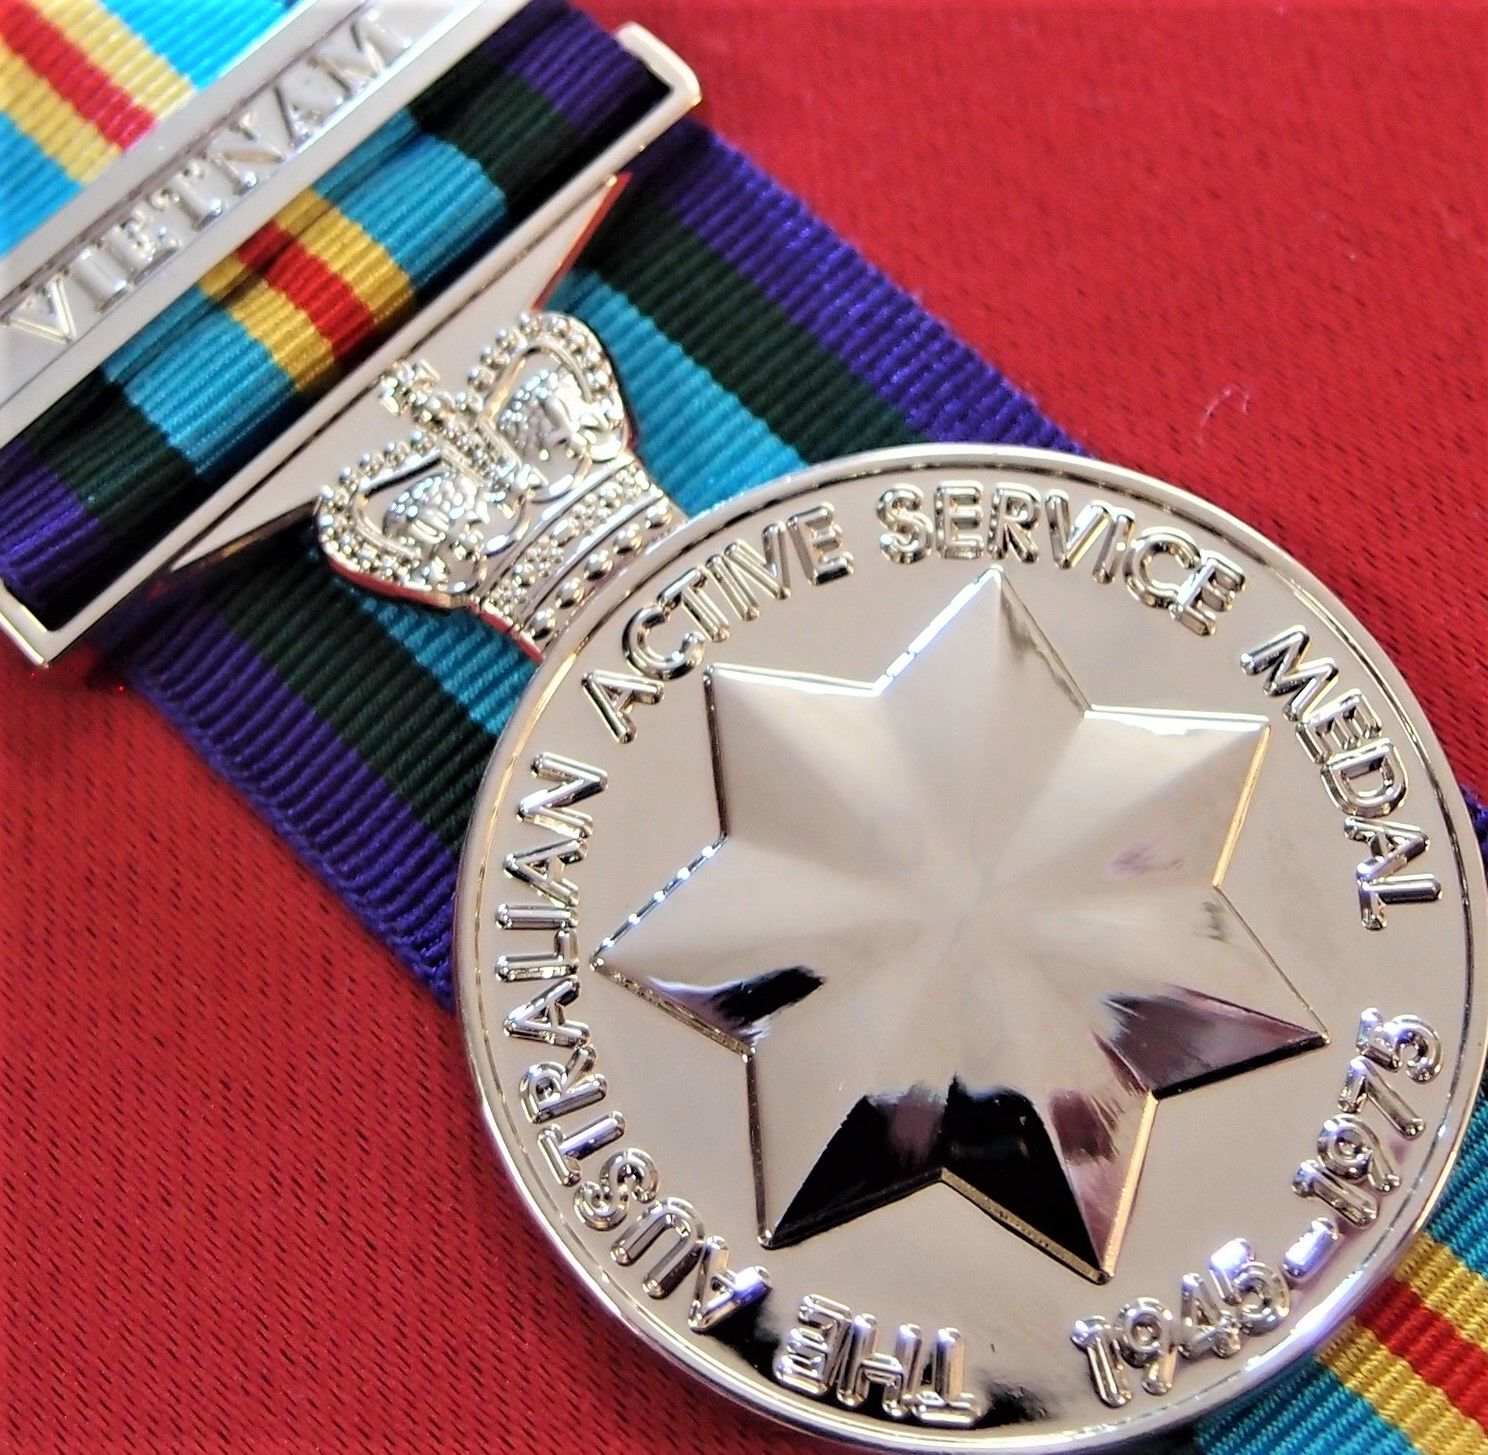 VIETNAM WAR ARMY NAVY AIR FORCE AUSTRALIAN ACTIVE SERVICE MEDAL 1945-75 REPLICA